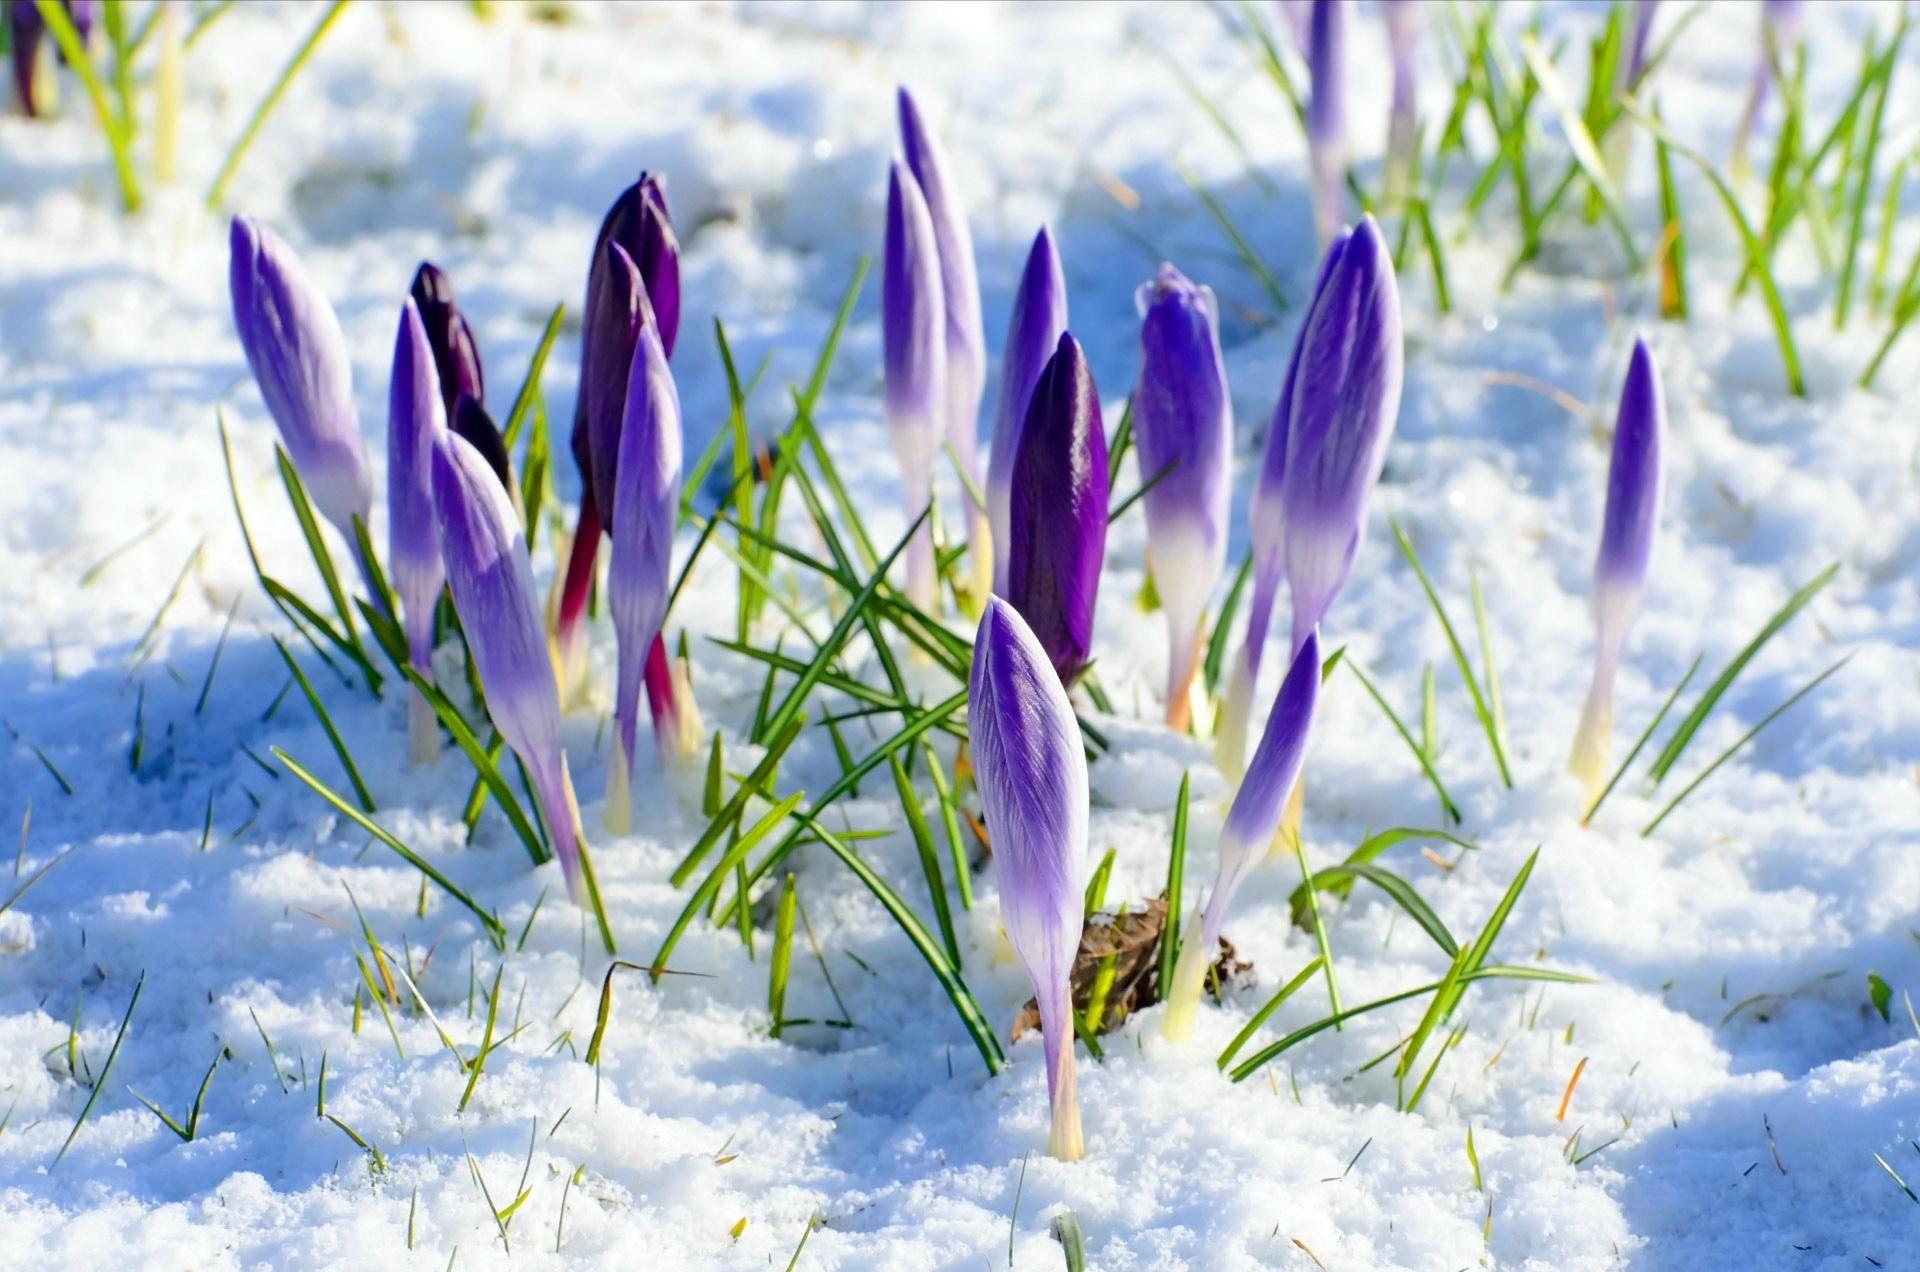 Spring Flower In Snow